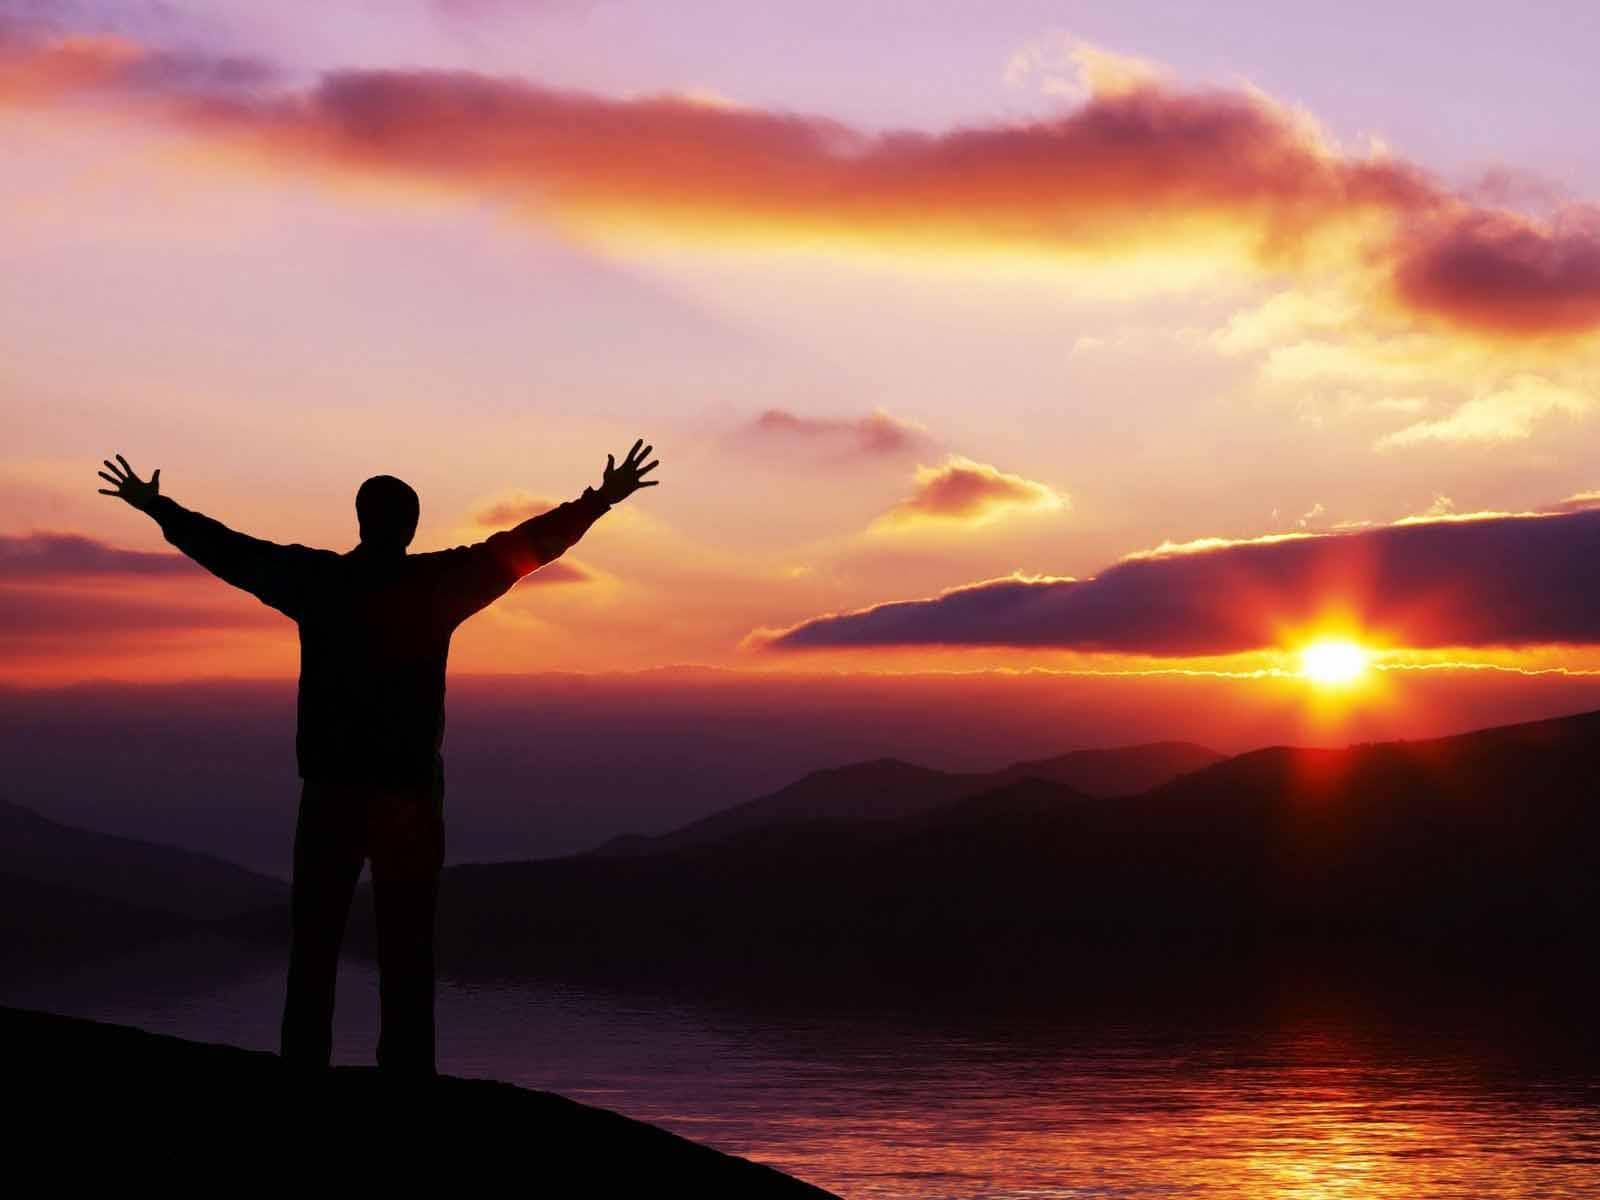 Fall Christian Wallpaper 10 Ways To Receive Gods Grace Today Beliefnet Com